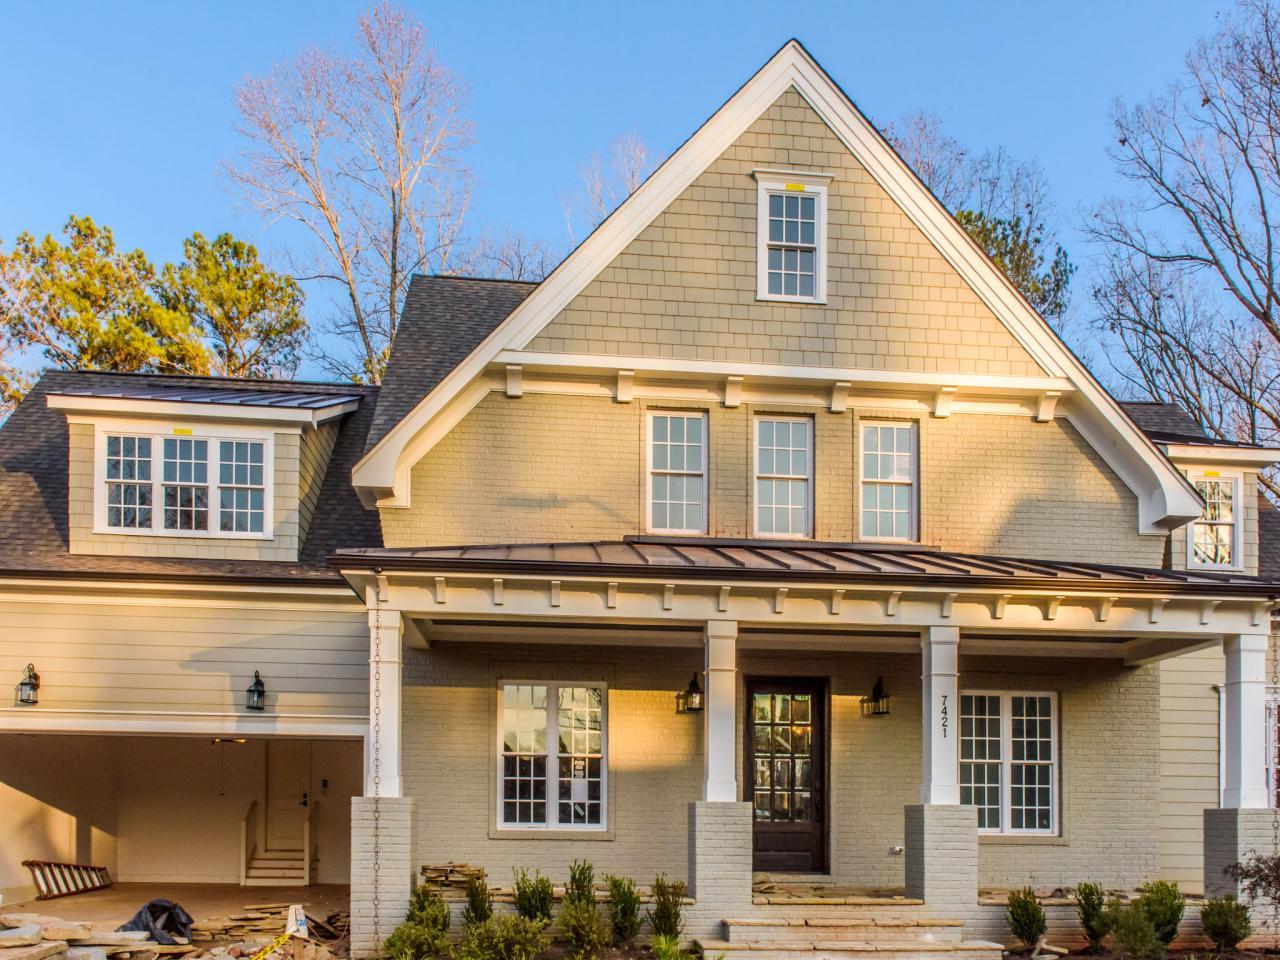 What 39 s the design plan for hgtv smart home 2016 hgtv for Smart home plan